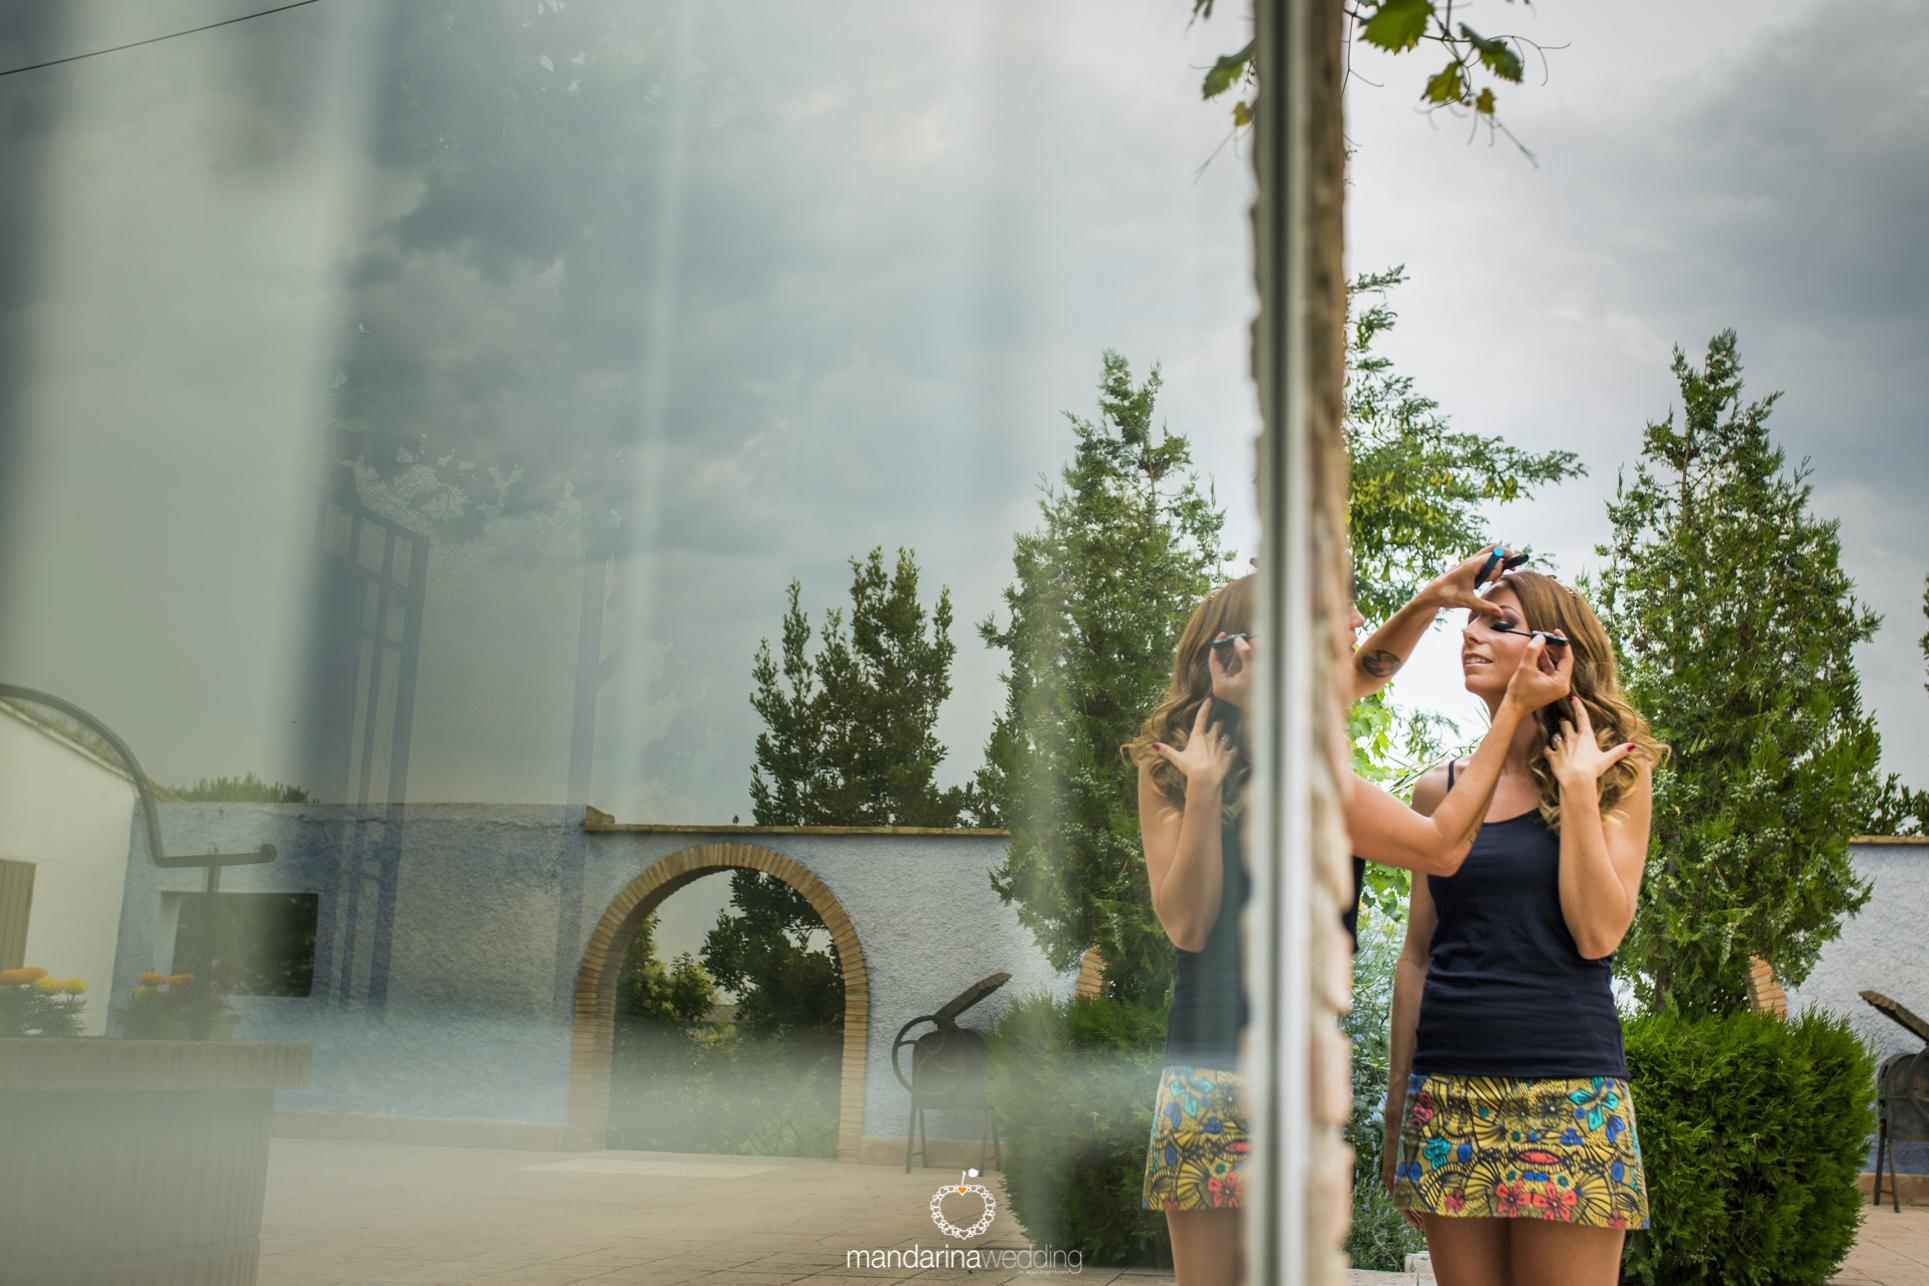 mandarina wedding, fotografo boda pais vasco, fotografo boda zaragoza, fotógrafo boda soria, fotografo boda Madrid, fotógrafo boda tarragona-32